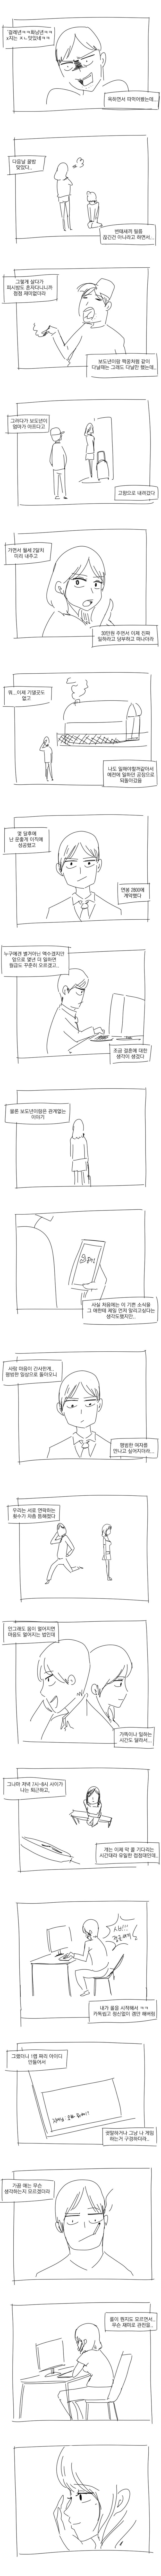 6.jpg ㅎㅂ) 노래방도우미랑 사귄 썰 [manwa]